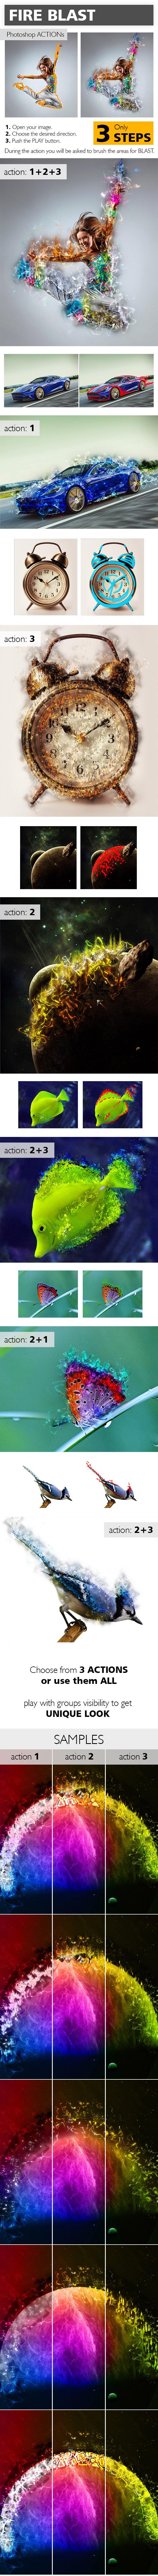 Fire Blast Photoshop Action - Actions Photoshop